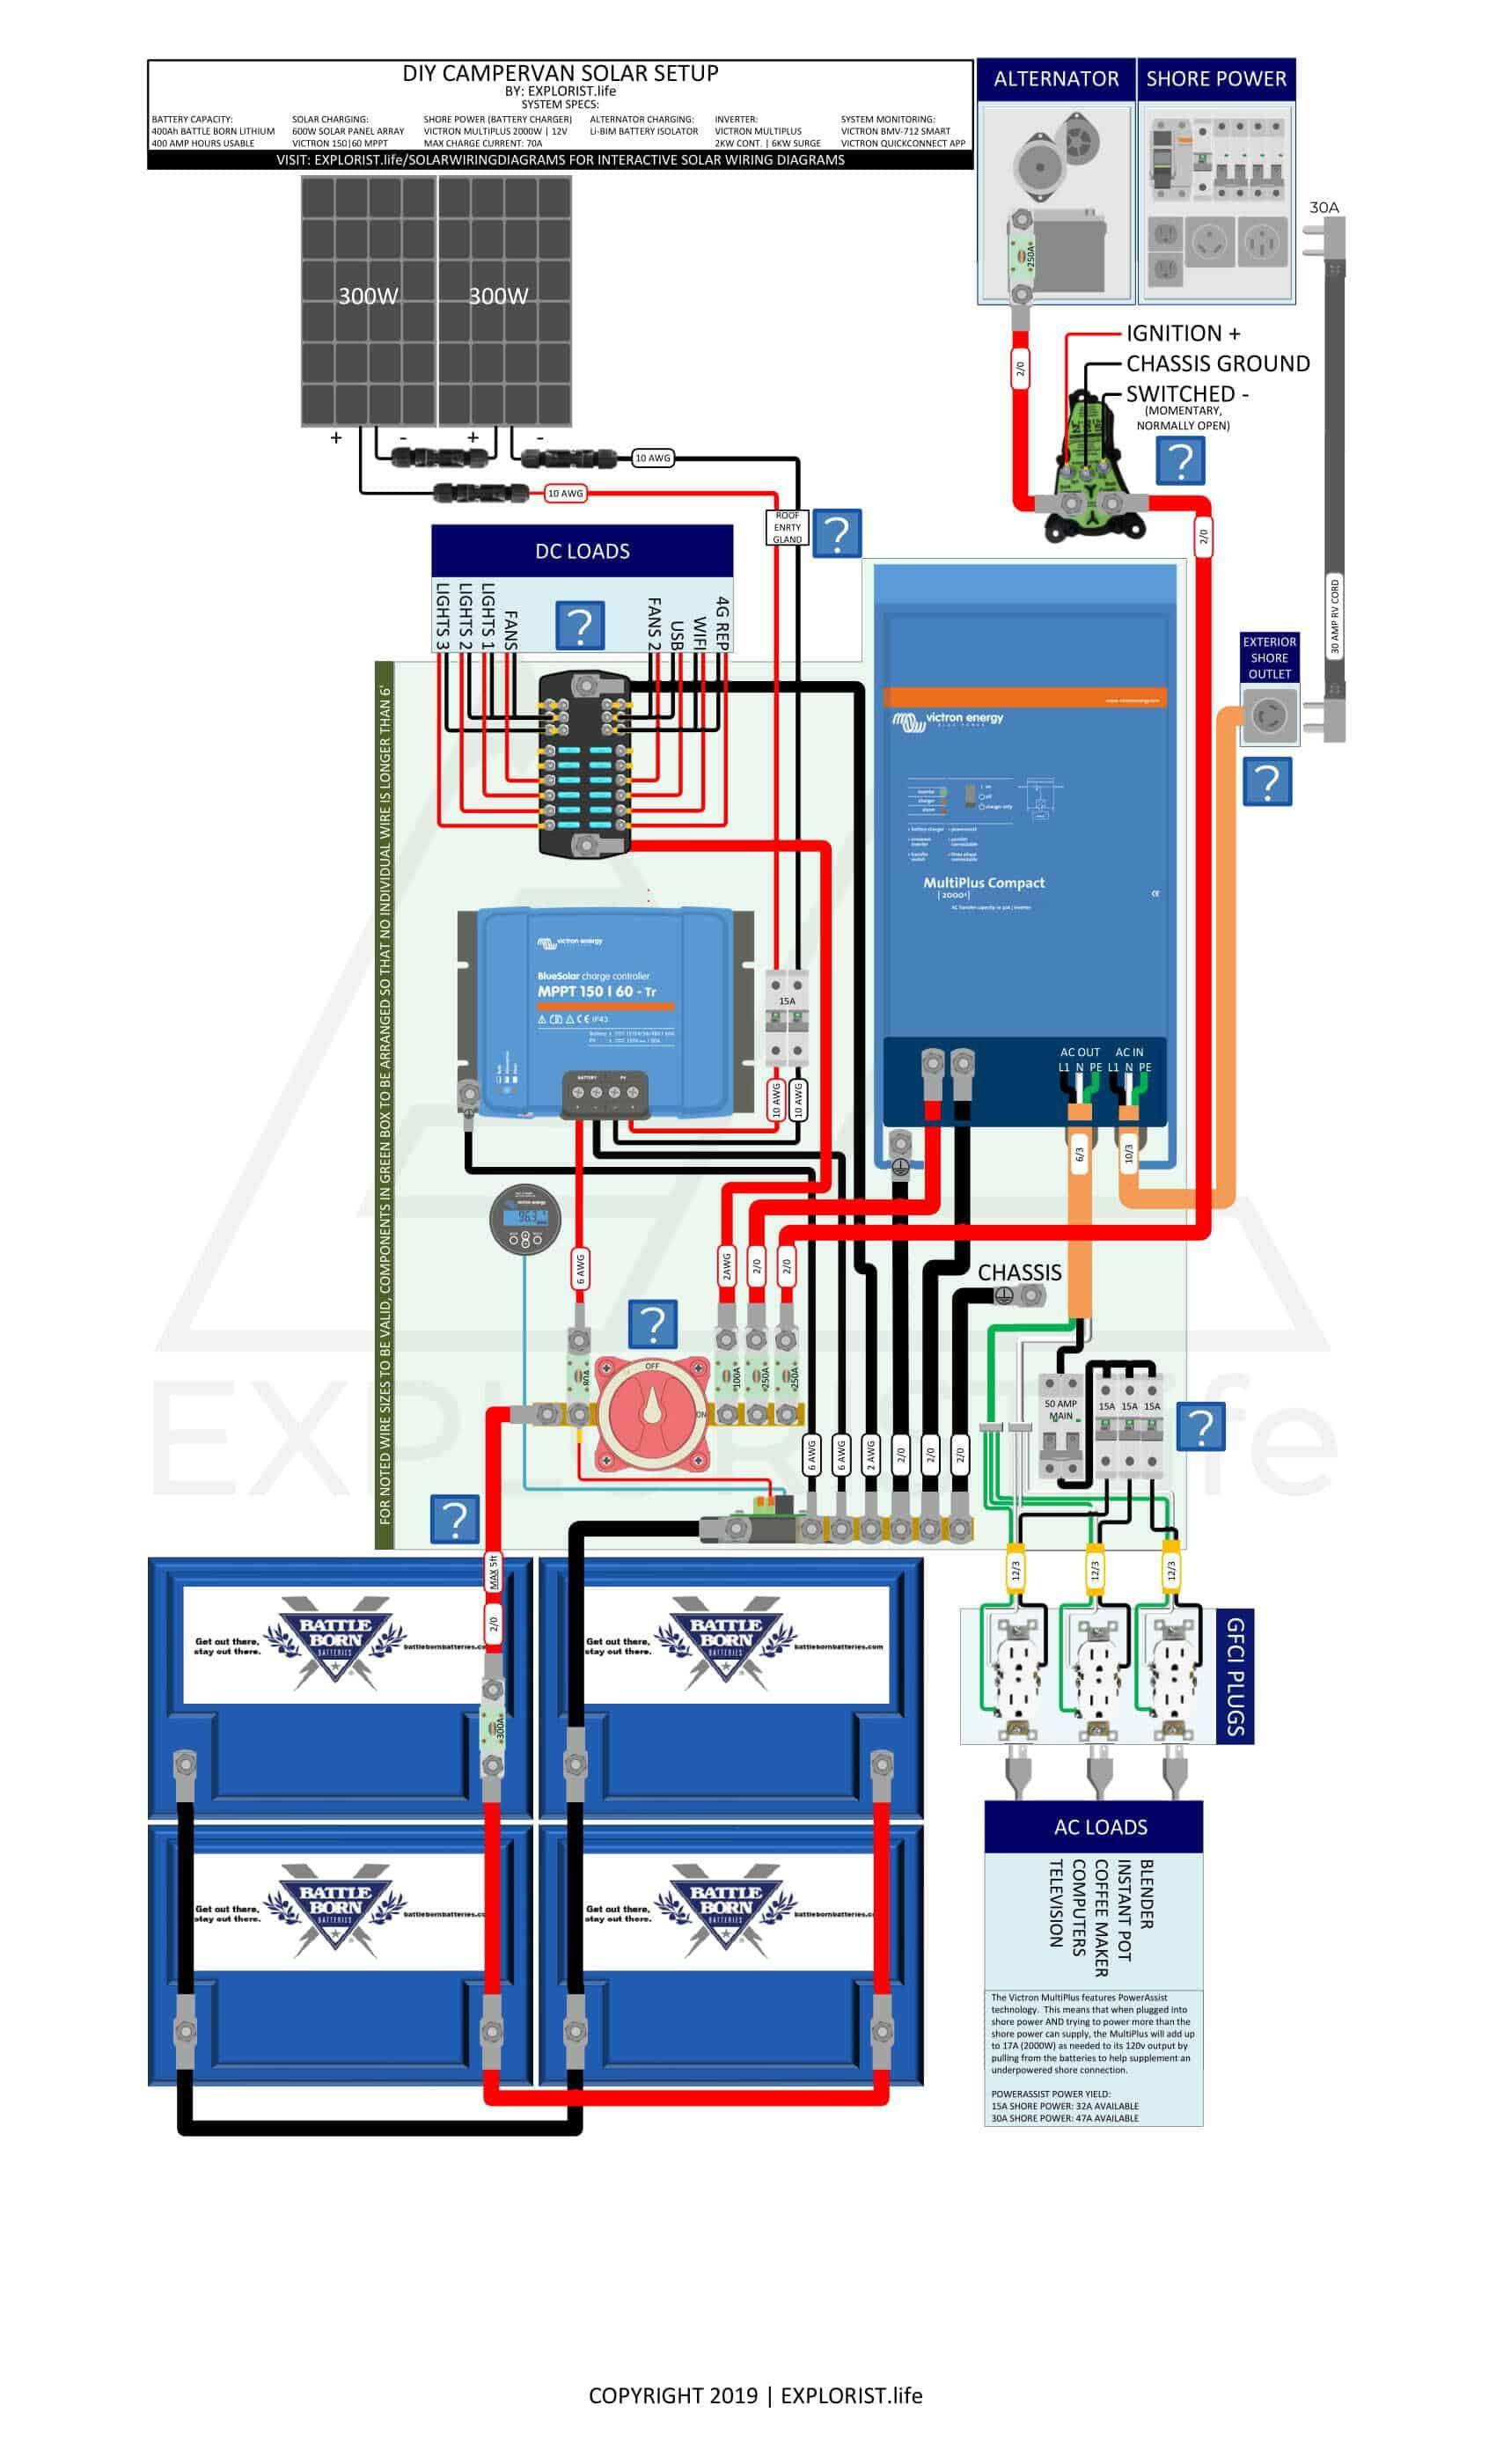 Diy Solar Wiring Diagrams For Campers Van S Rv S Diy Solar Solar Panels Solar Panel System